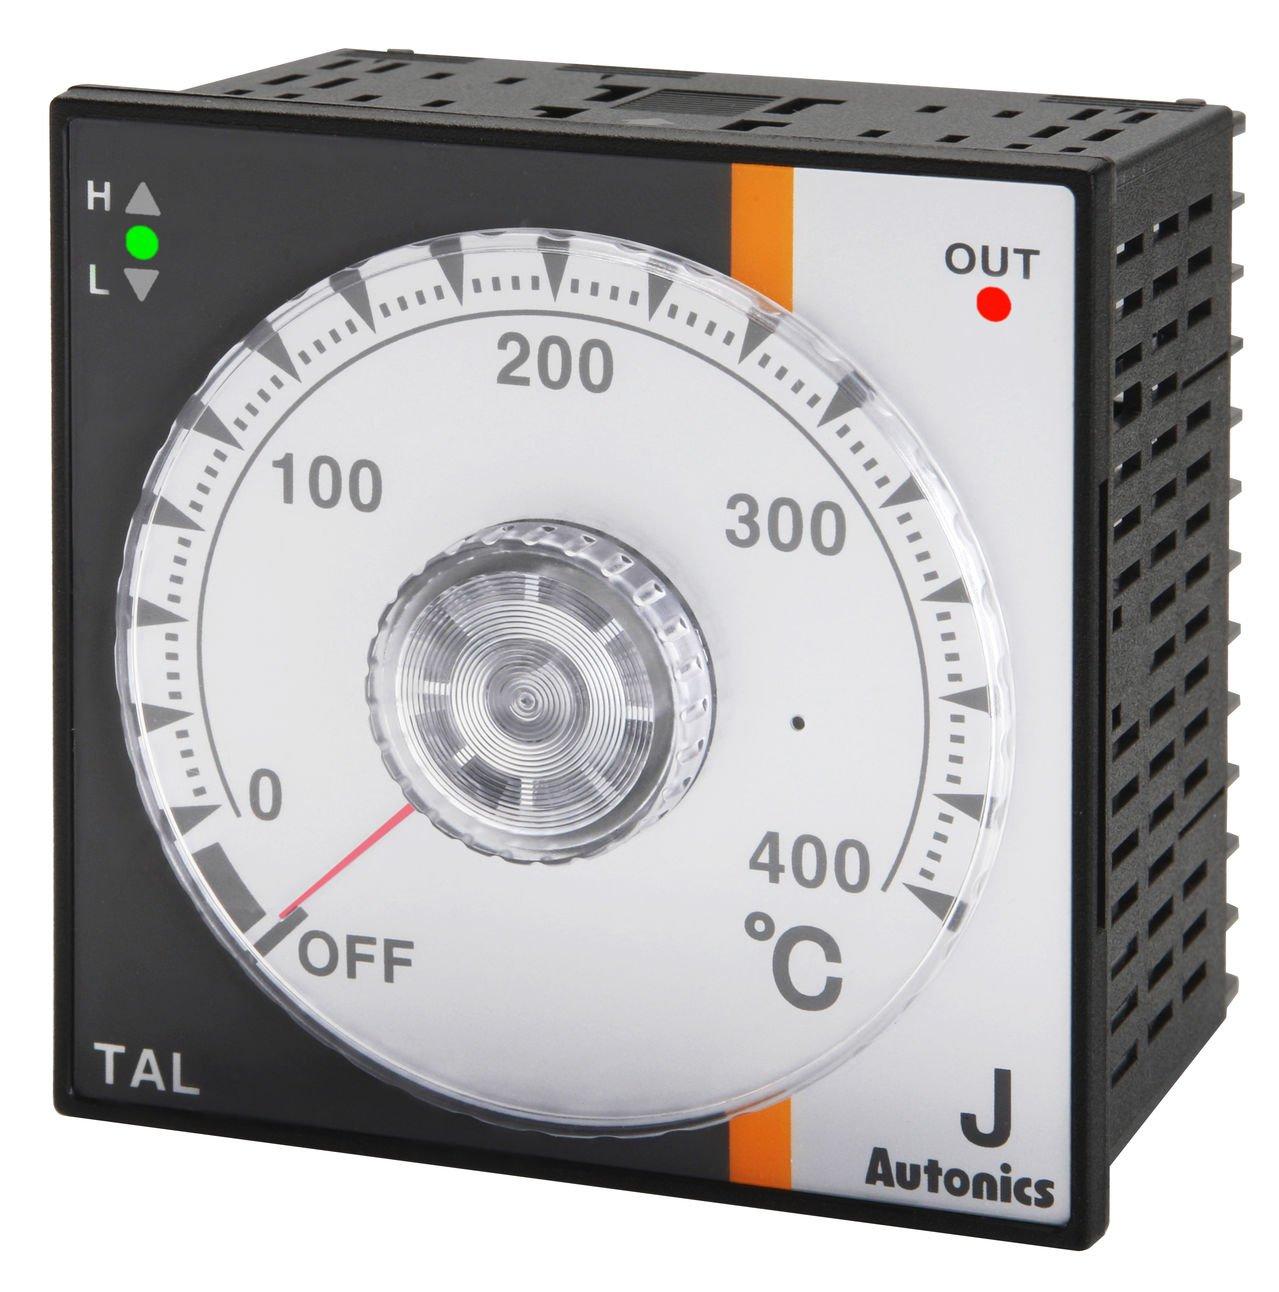 Autonics TAL-B4RJ2C Temp Control, 1/4 DIN, Analog, PID Control, Relay Output, J Thermocouple, 200 C, 100-240 VAC